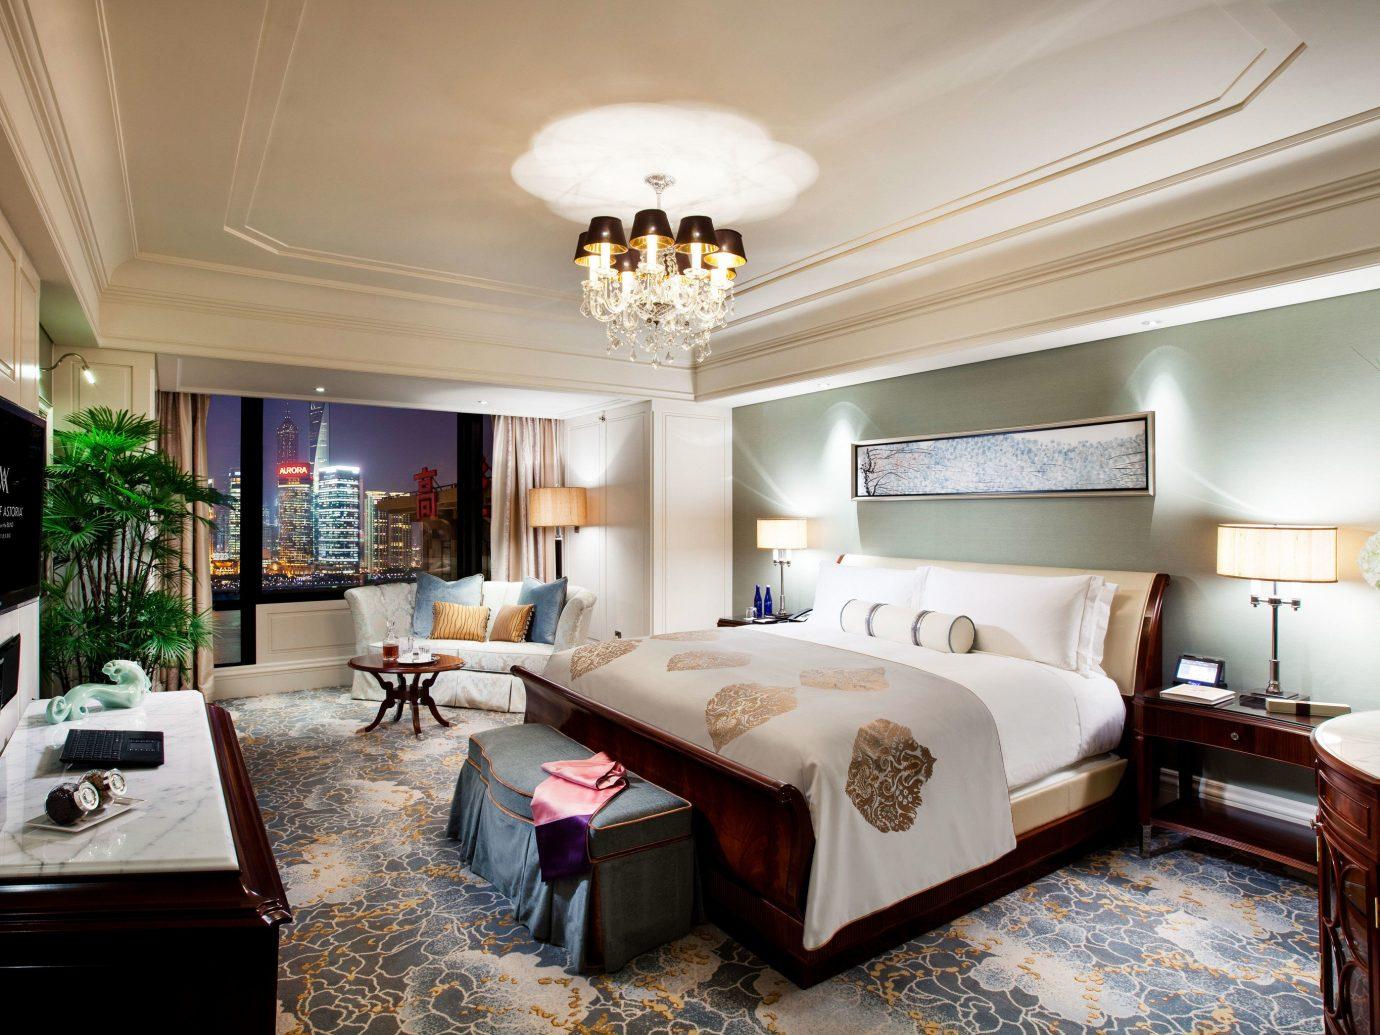 Boutique Hotels Luxury Travel indoor floor wall ceiling sofa room bed interior design Suite Bedroom living room real estate furniture home estate interior designer hotel decorated